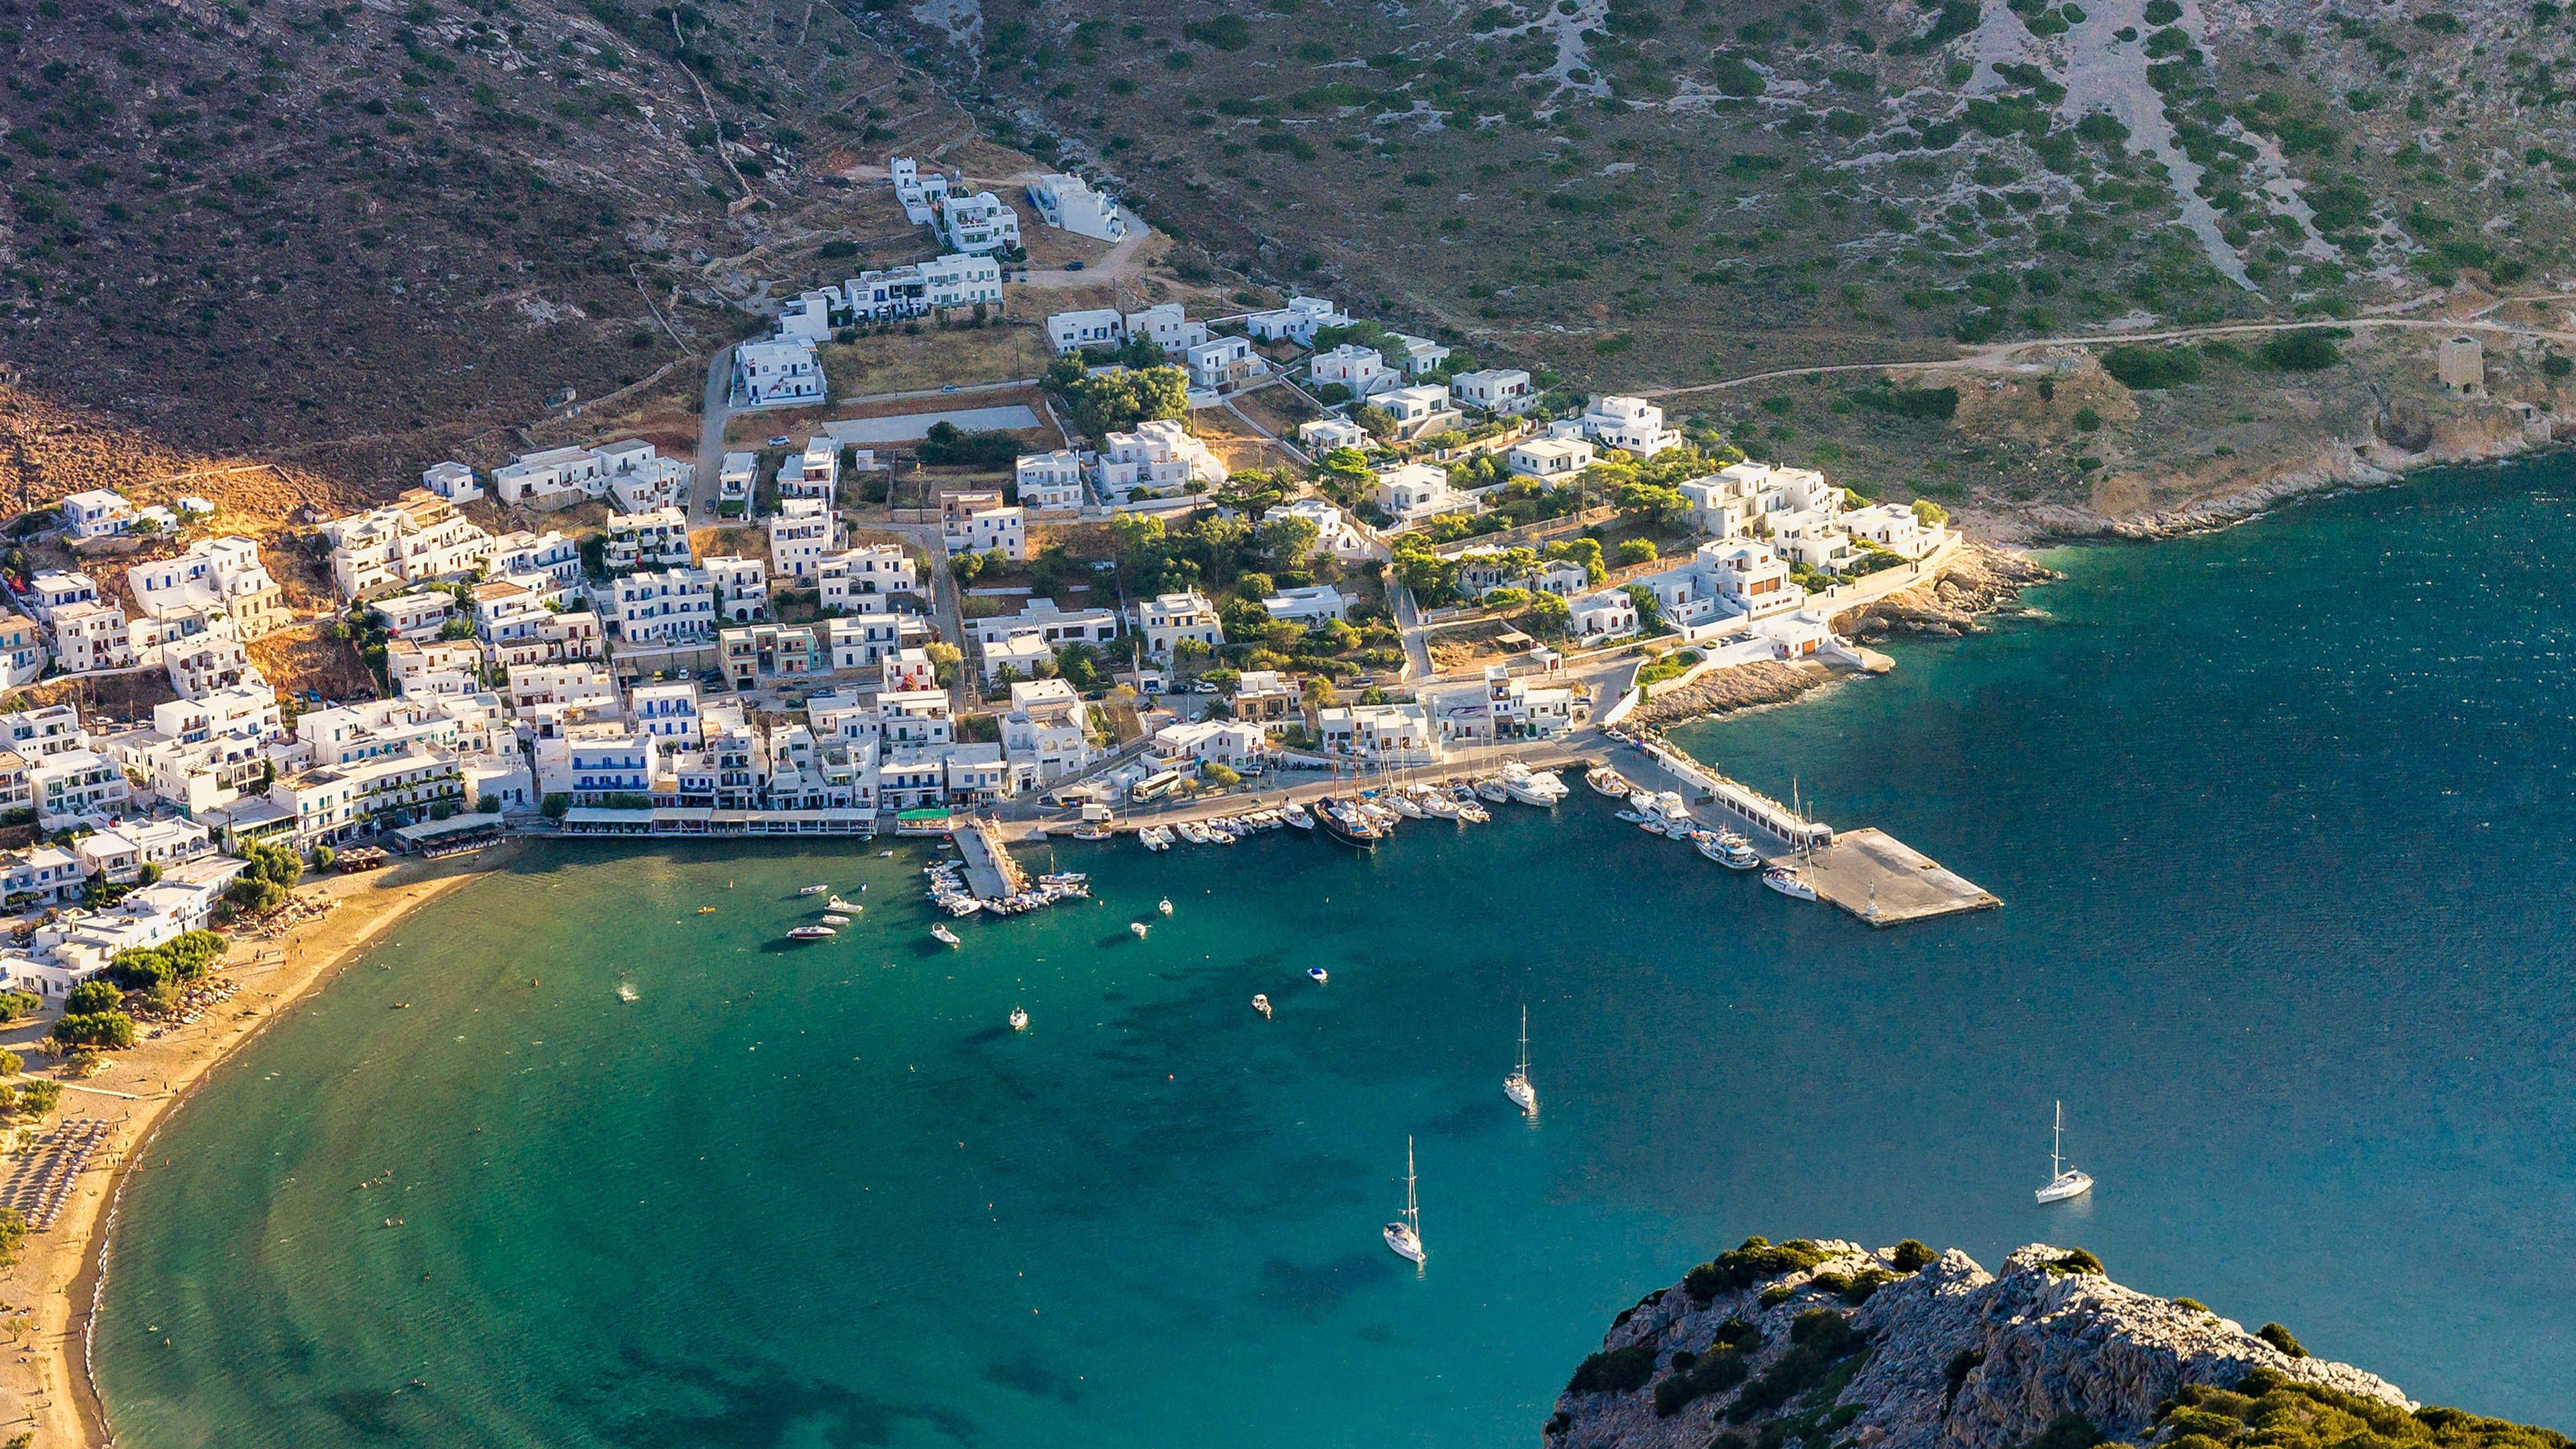 Nh18 Greece Beach Town Sea Mountain Summer Vacation Wallpaper 3840